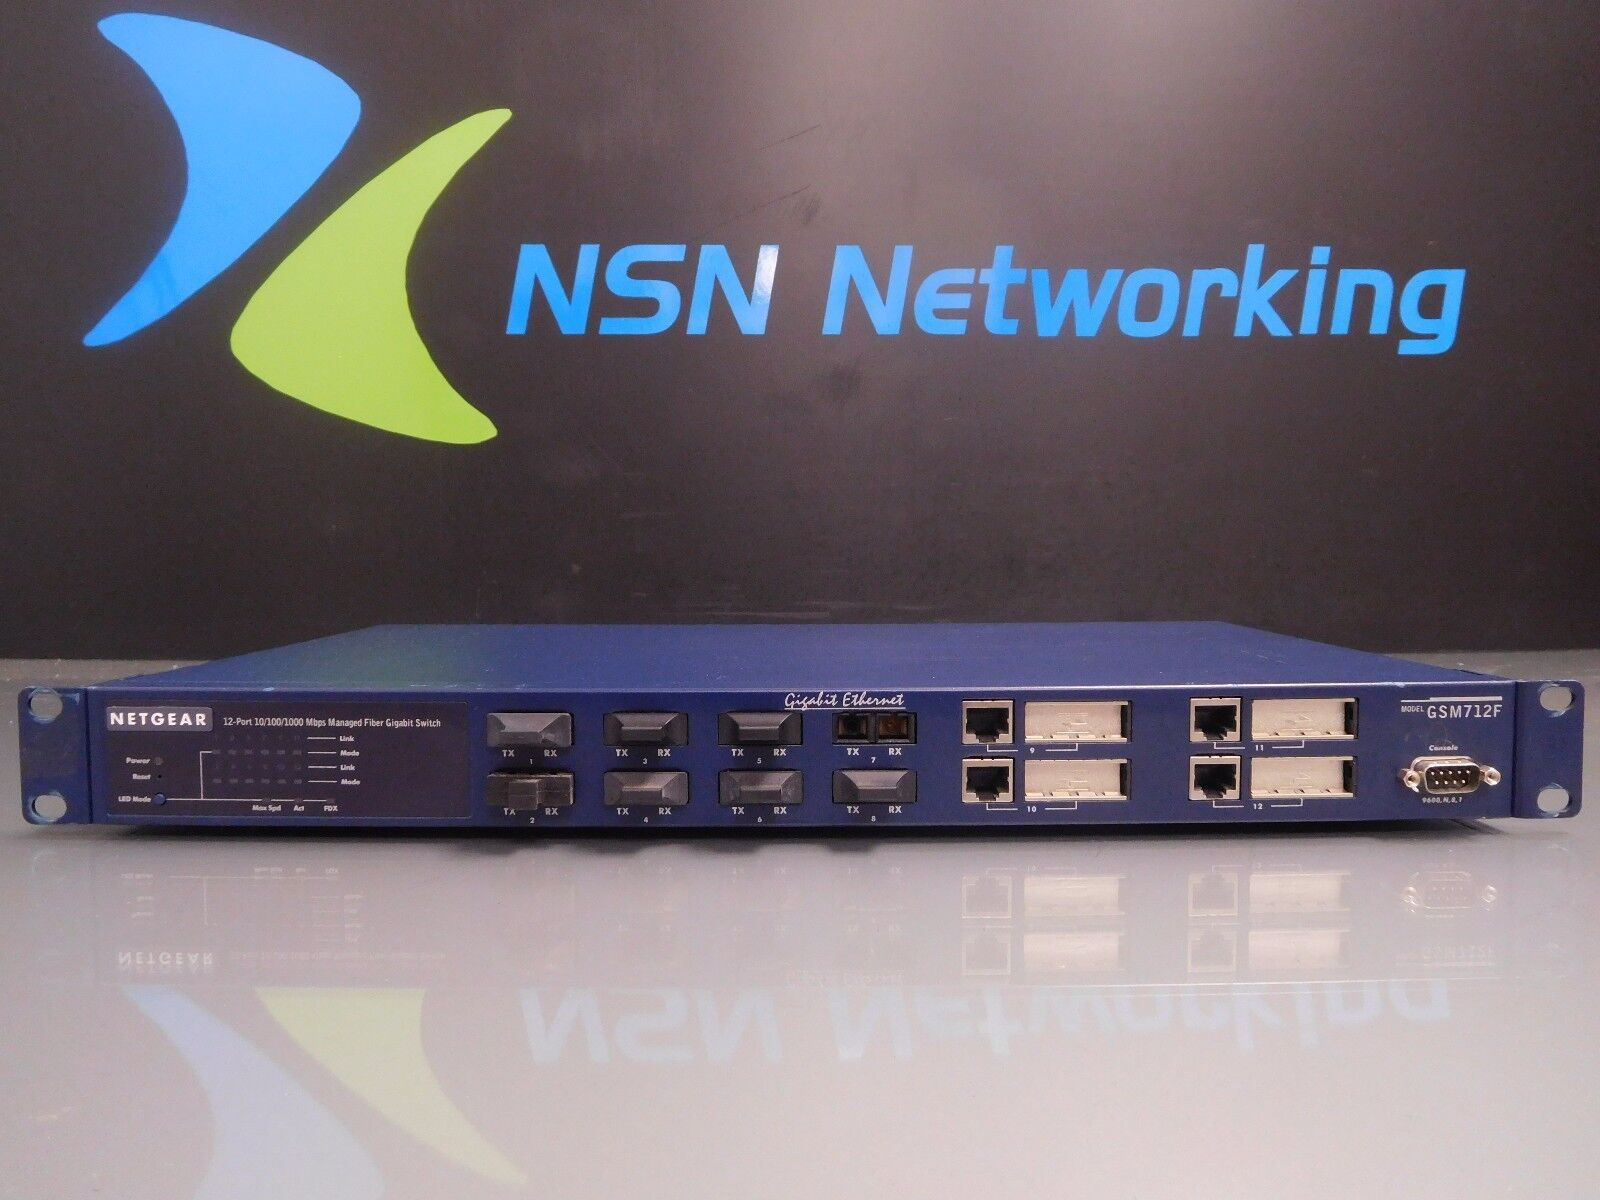 Driver UPDATE: NETGEAR GSM712F Switch